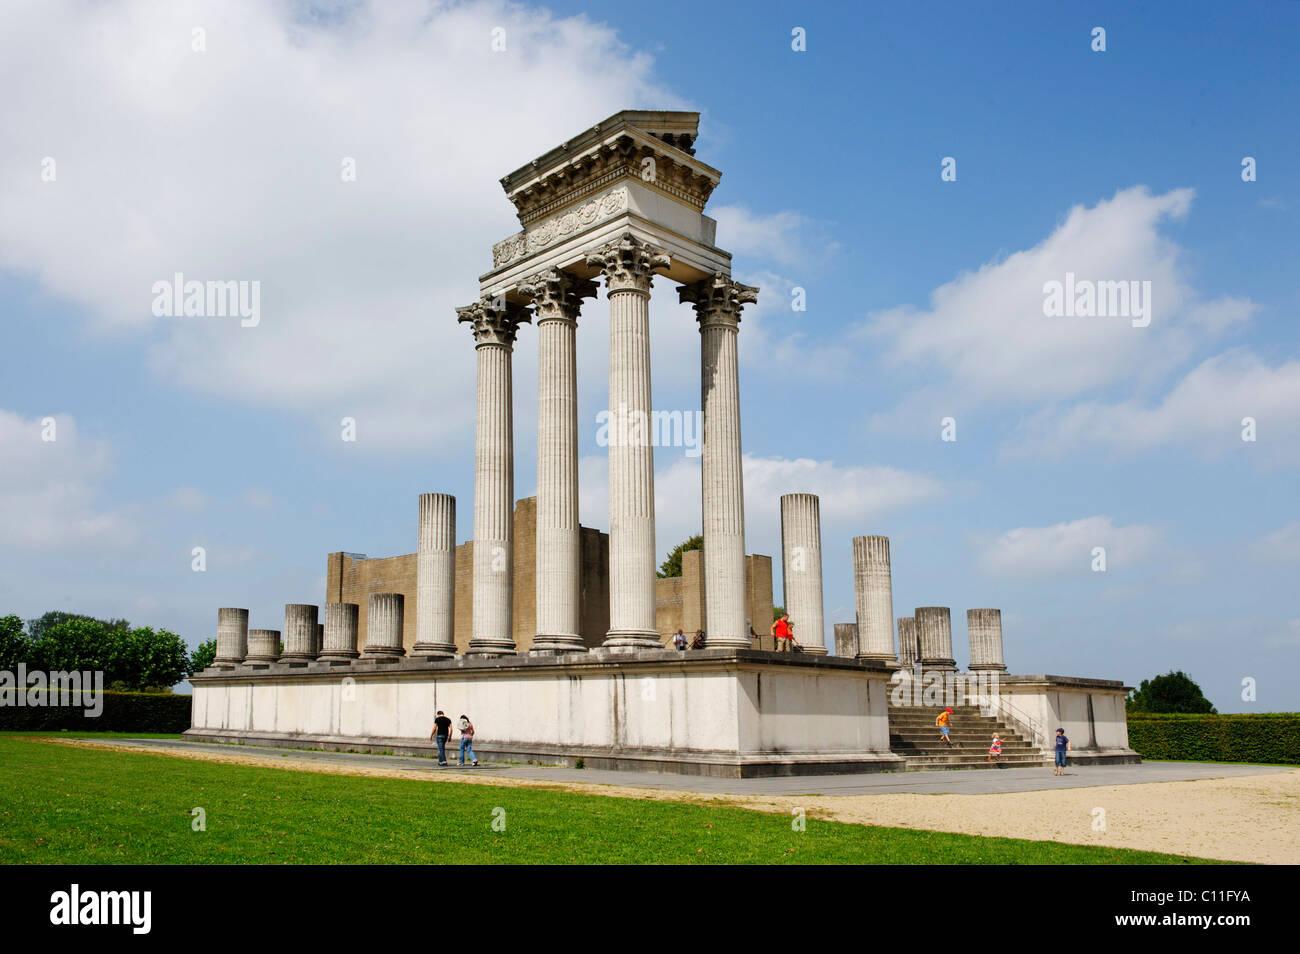 Hafentempel, temple of the harbor, reconstruction, Archaeolgical Park Xanten, North Rhine-Westfalia, Germany, Europe - Stock Image